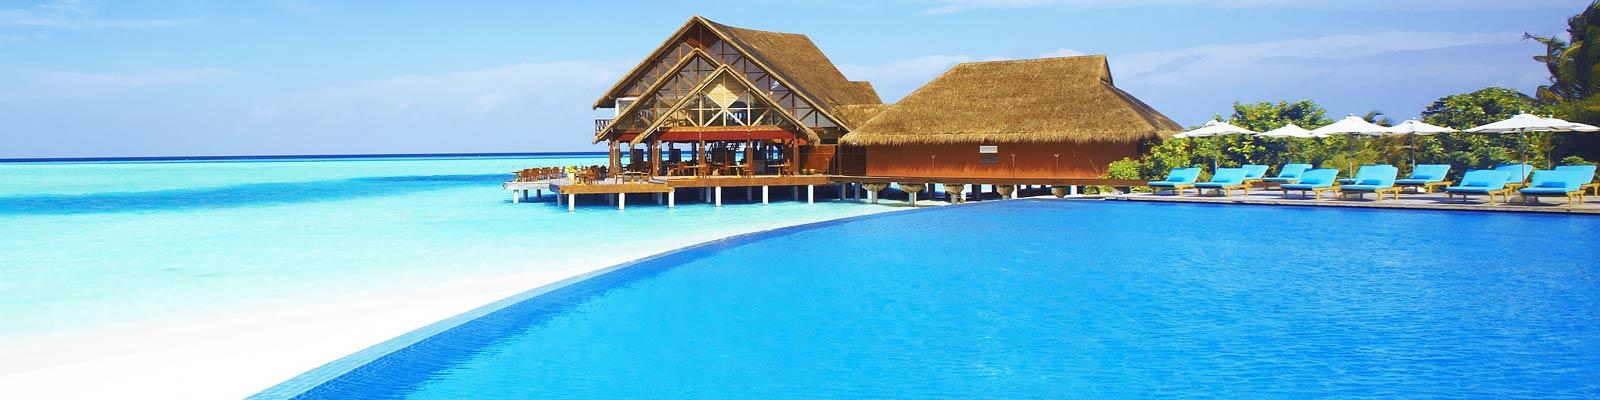 Laos Luxury Beach Resorts